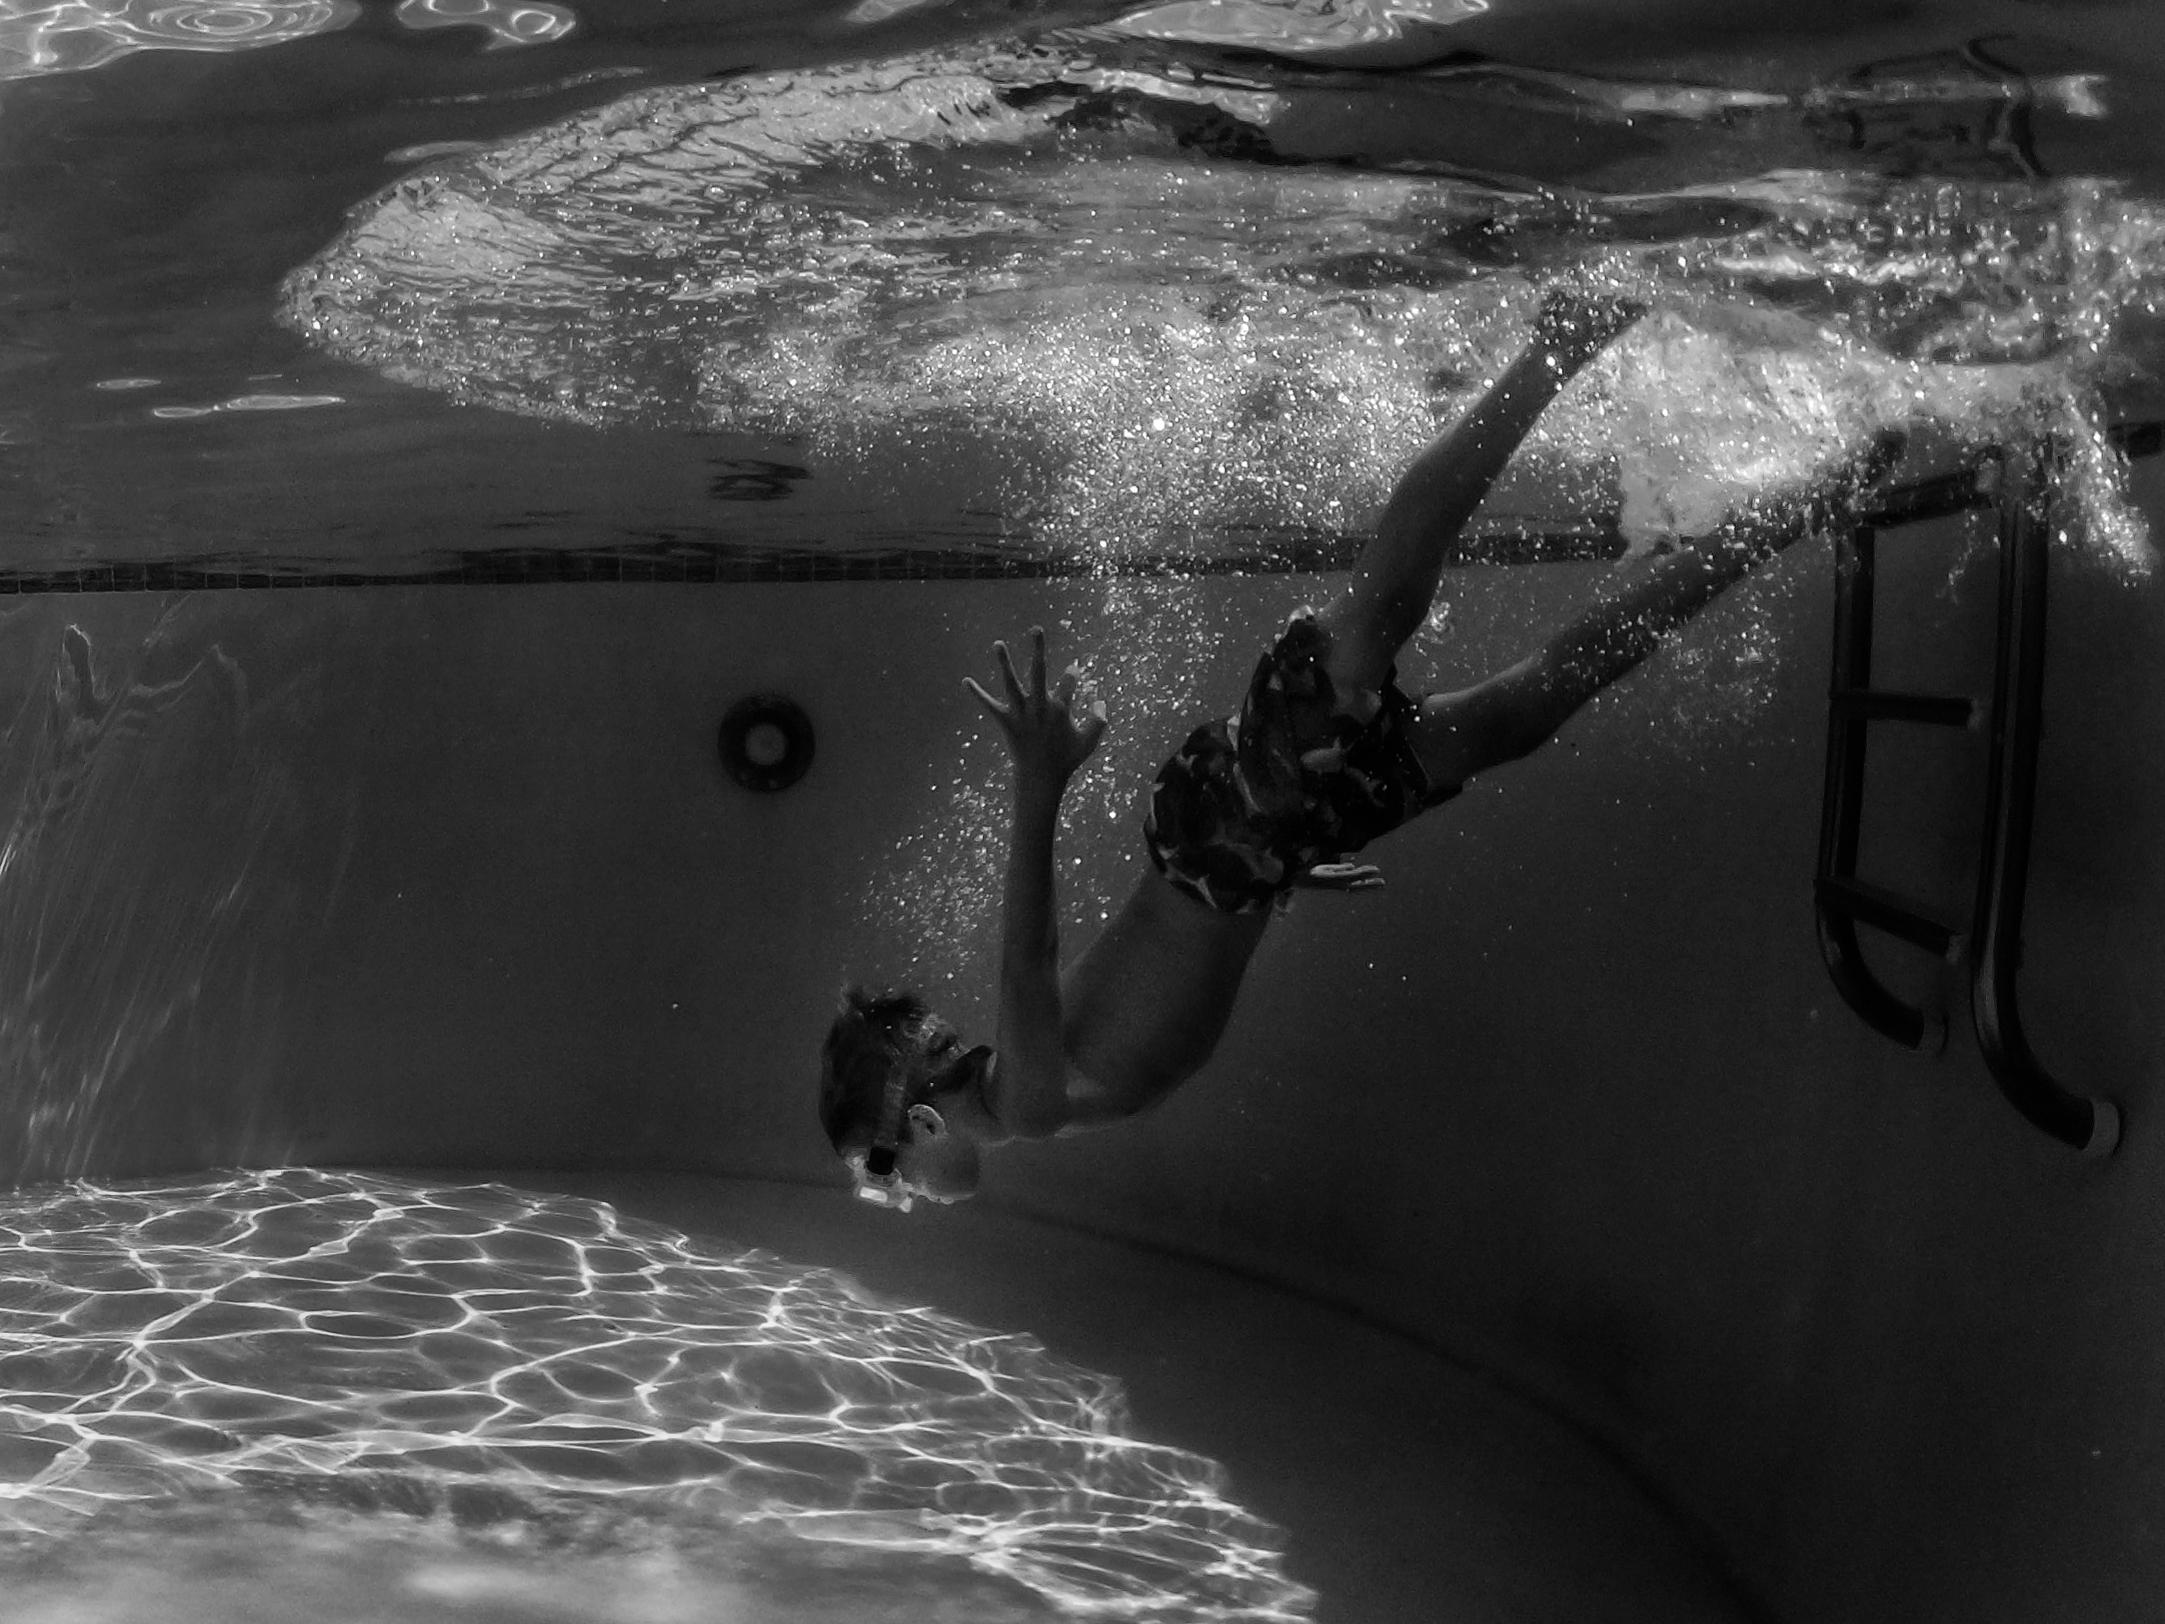 Kari Gierach Photography, Milwaukee Photographer, Underwater Photography-5.jpg